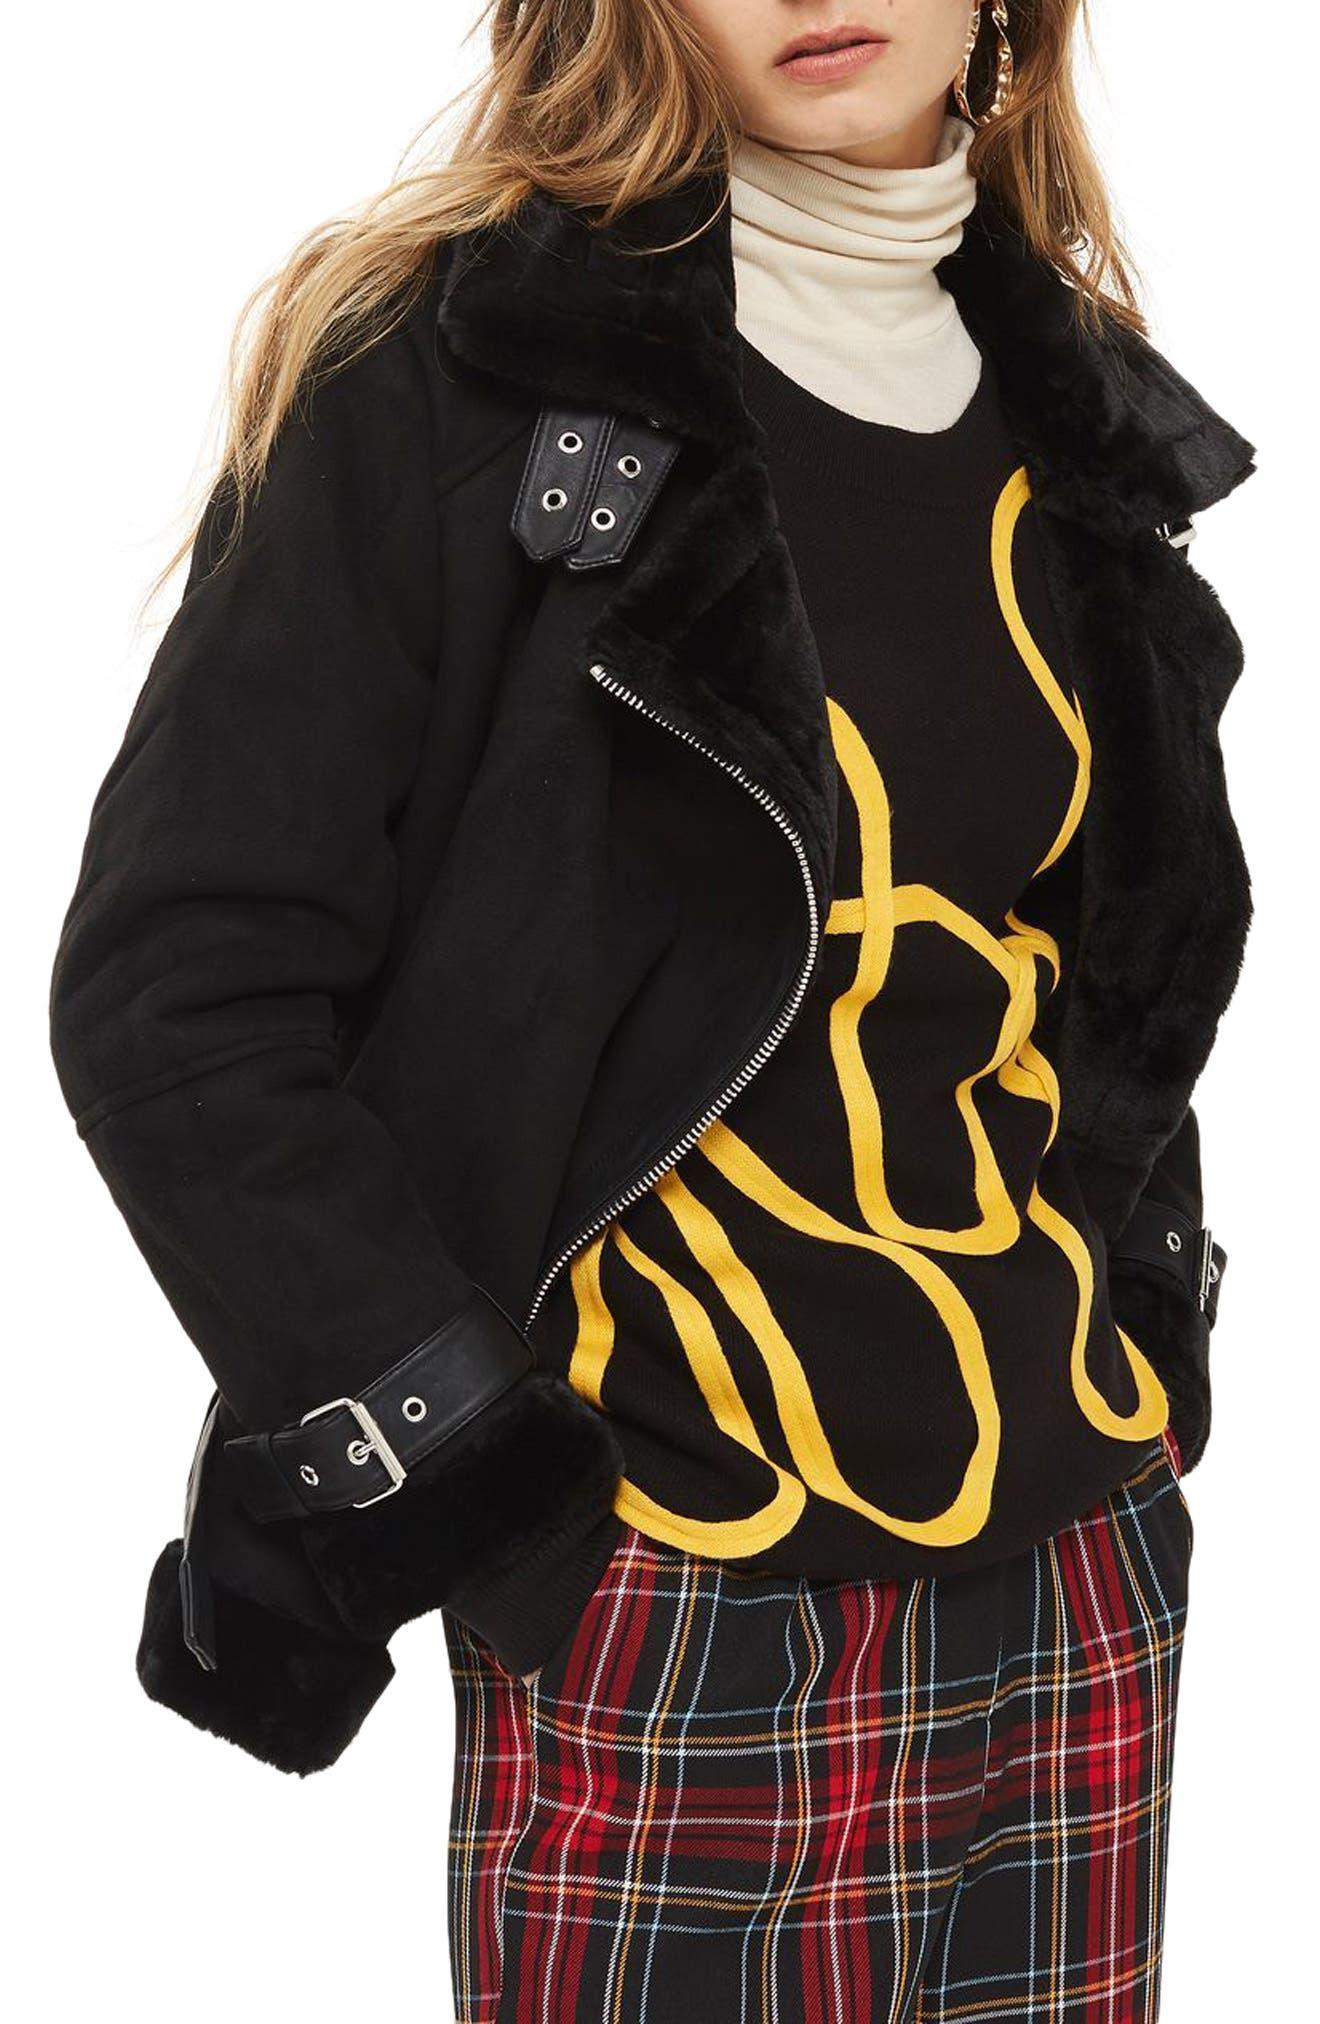 Topshop Faux Shearling Biker Jacket (Petite)